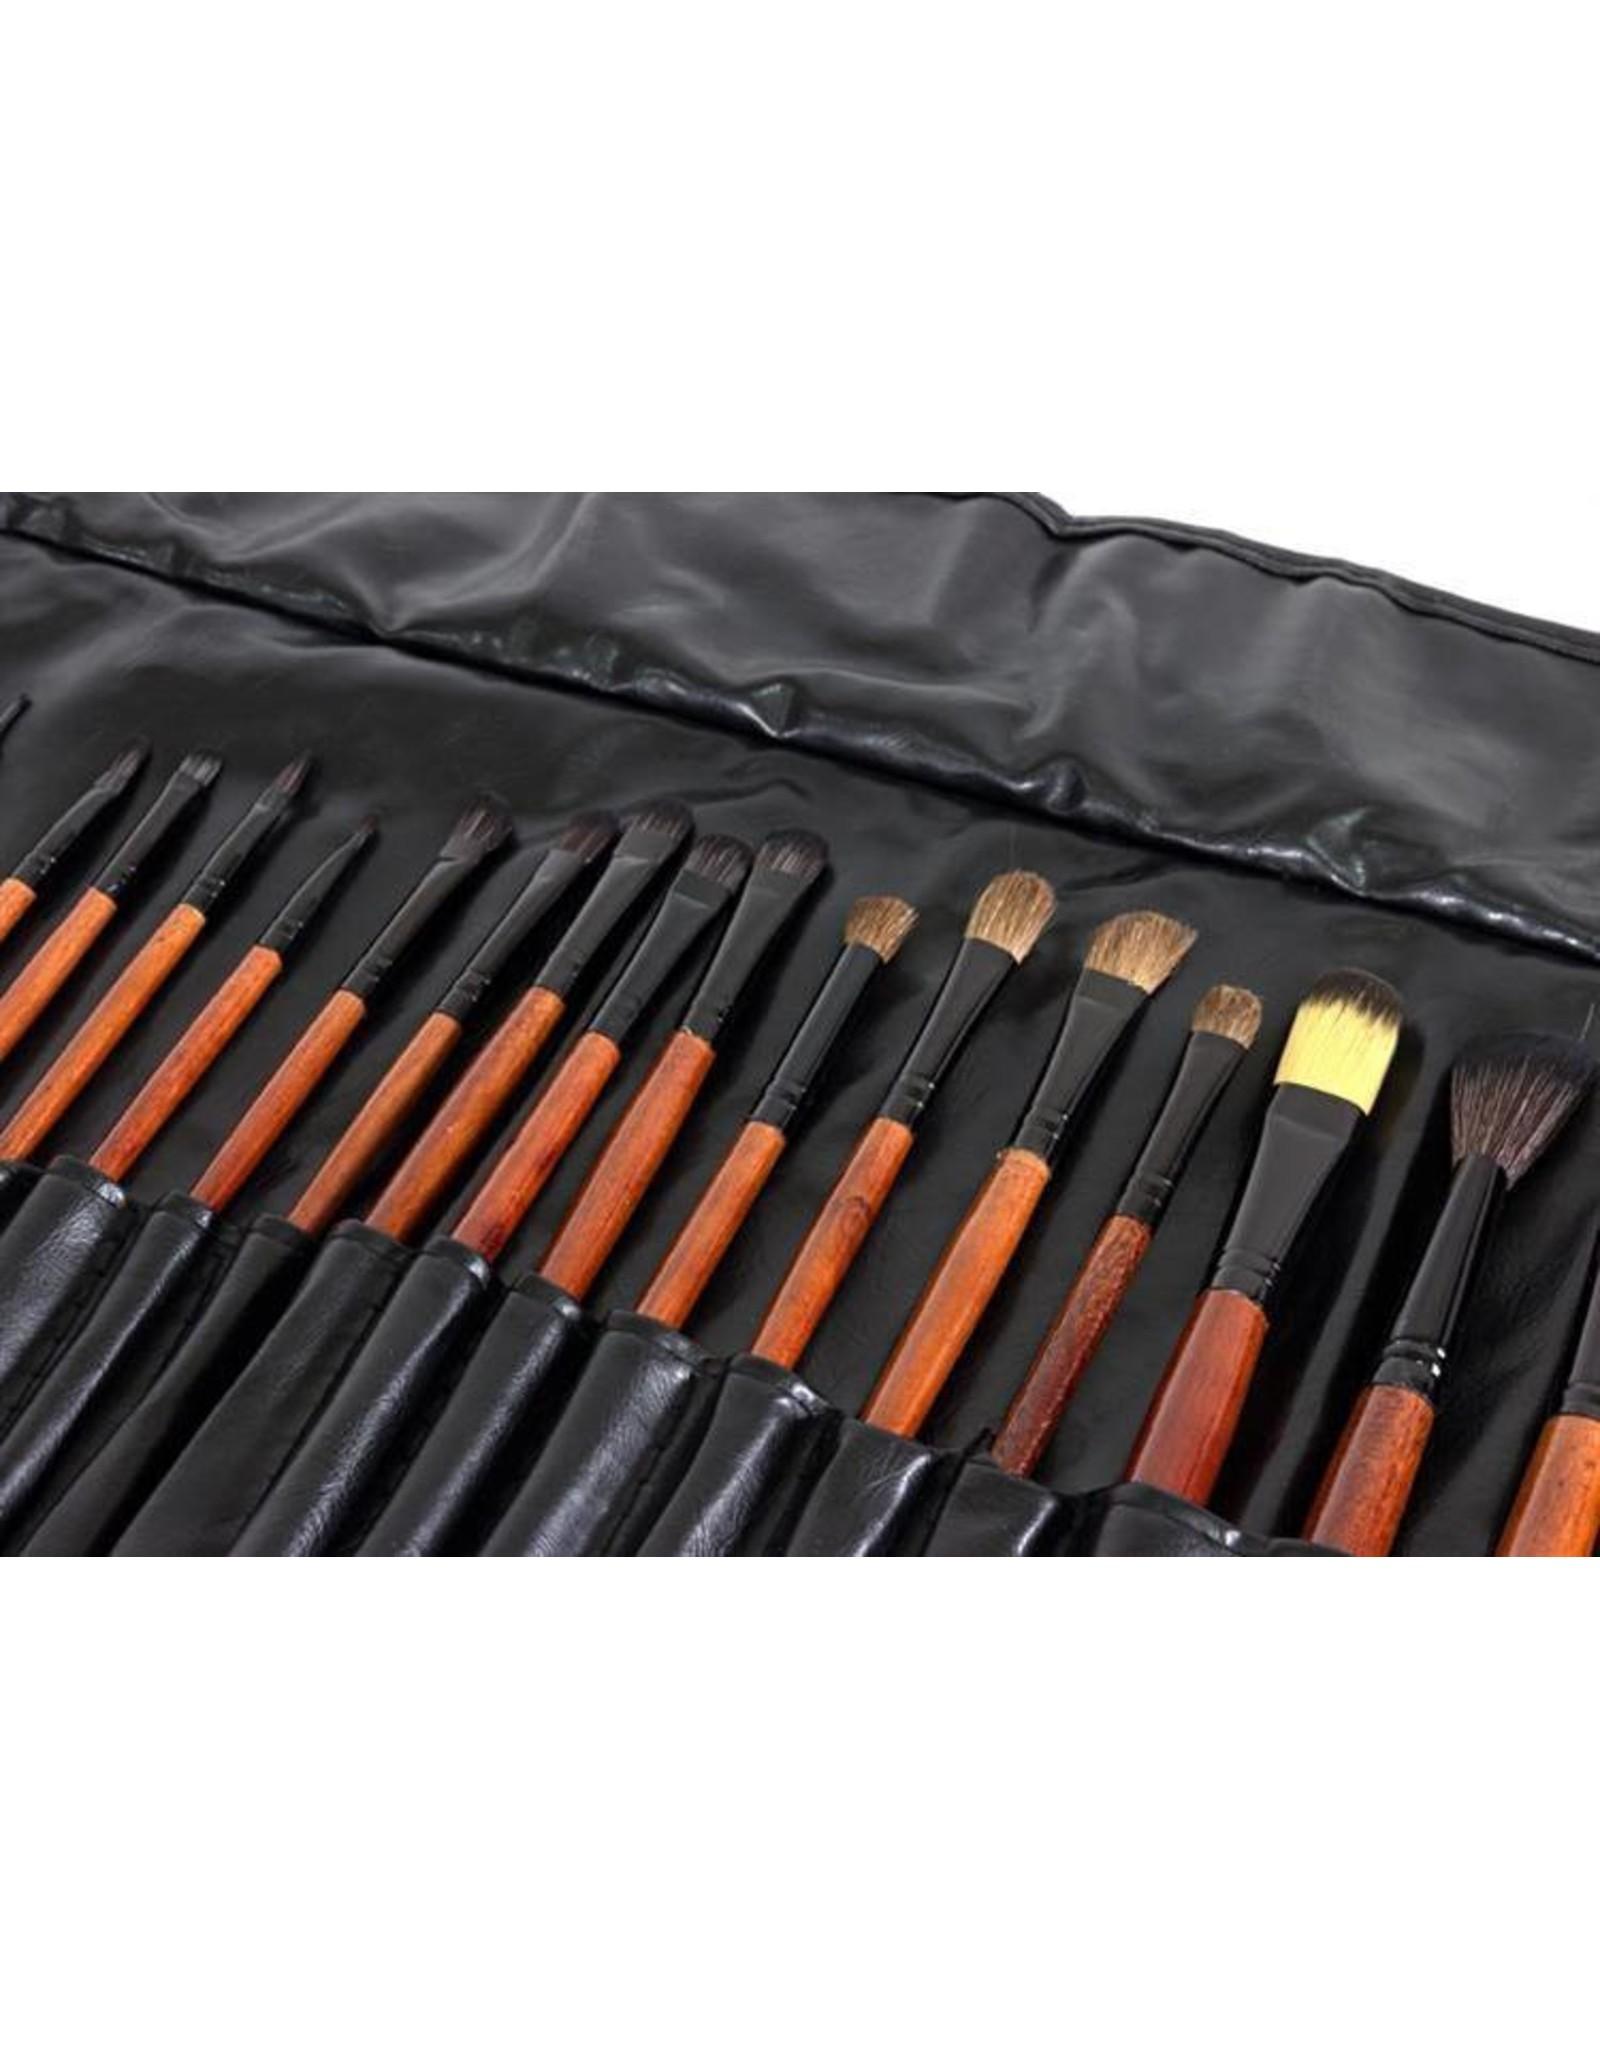 Merkloos Make - up kwasten  (24 delige)